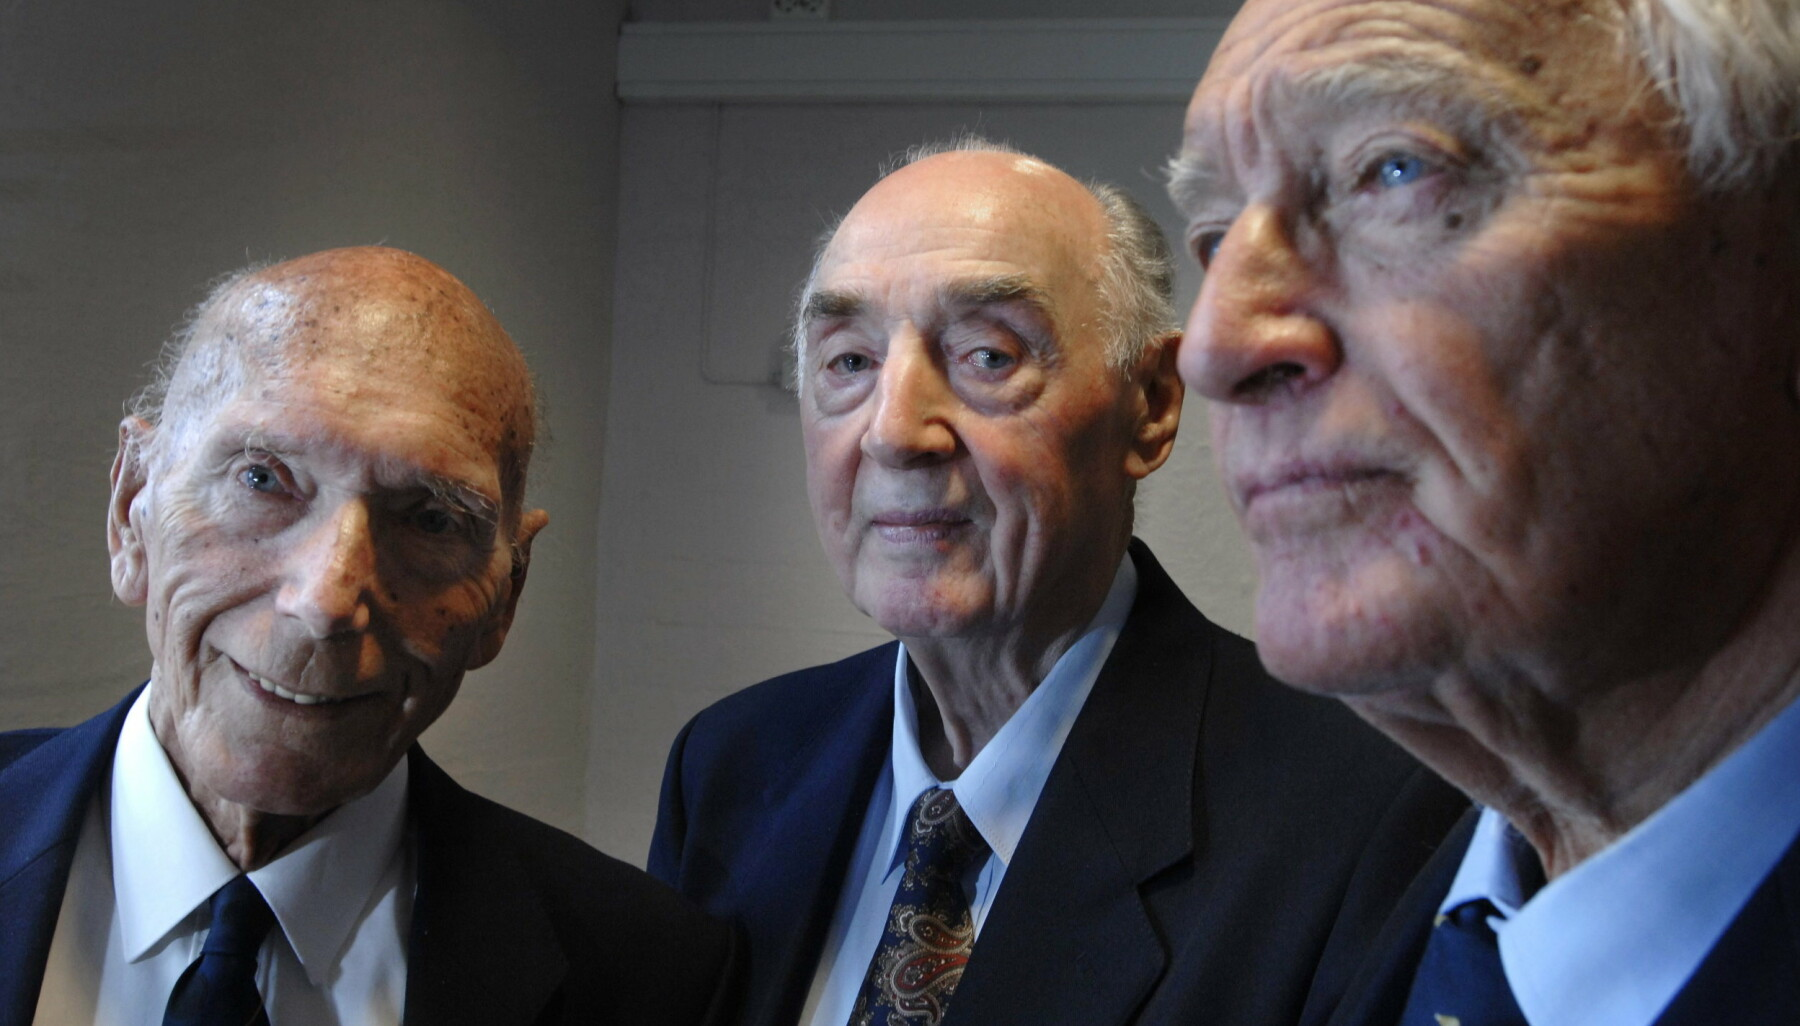 LINGEKLUBBEN: Rathke (t.h) og Strandheim sammen med Eilert Eilertsen, Linge-veteran og tidligere ordfører i Bergen. Alle tre har holdt kontakten med gamle krigskamerater via Lingeklubben.